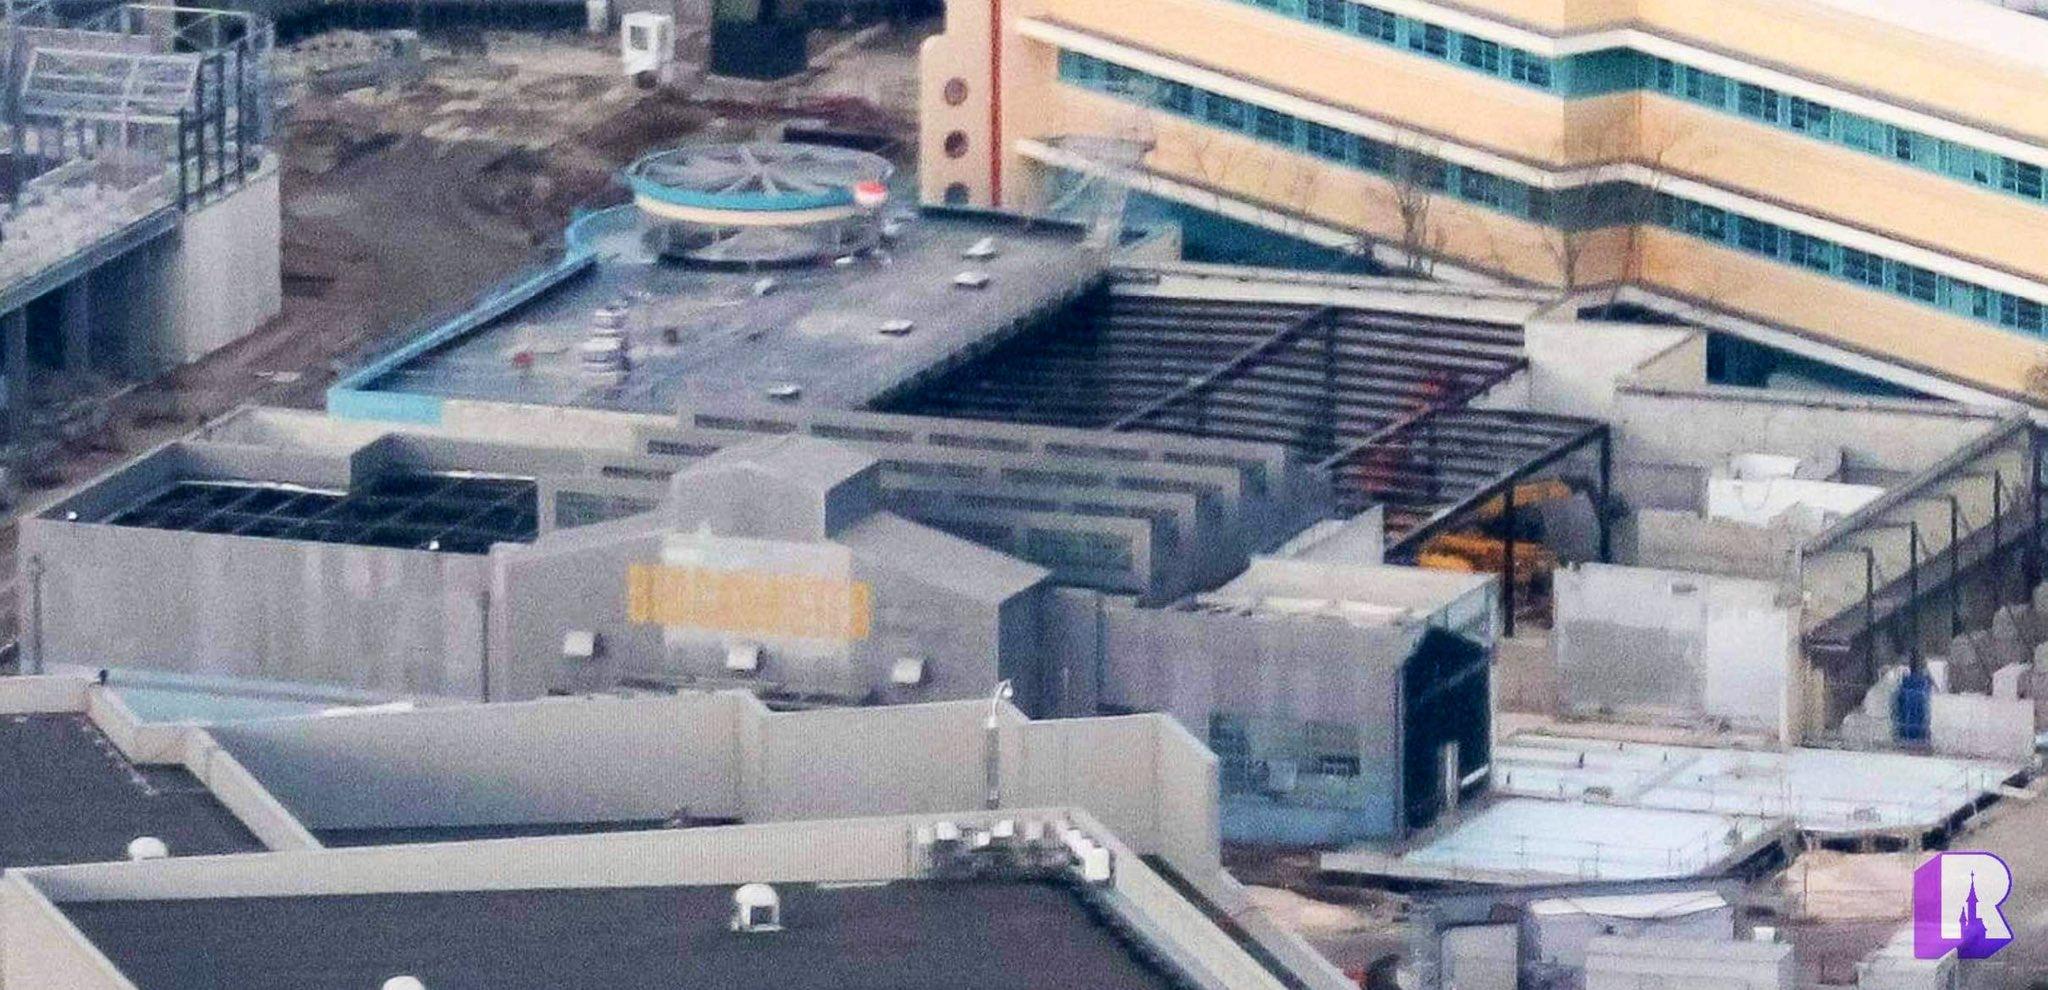 Avengers Campus [Parc Walt Disney Studios - 2022] - Page 28 ErThL9kXIAAUw5u?format=jpg&name=large